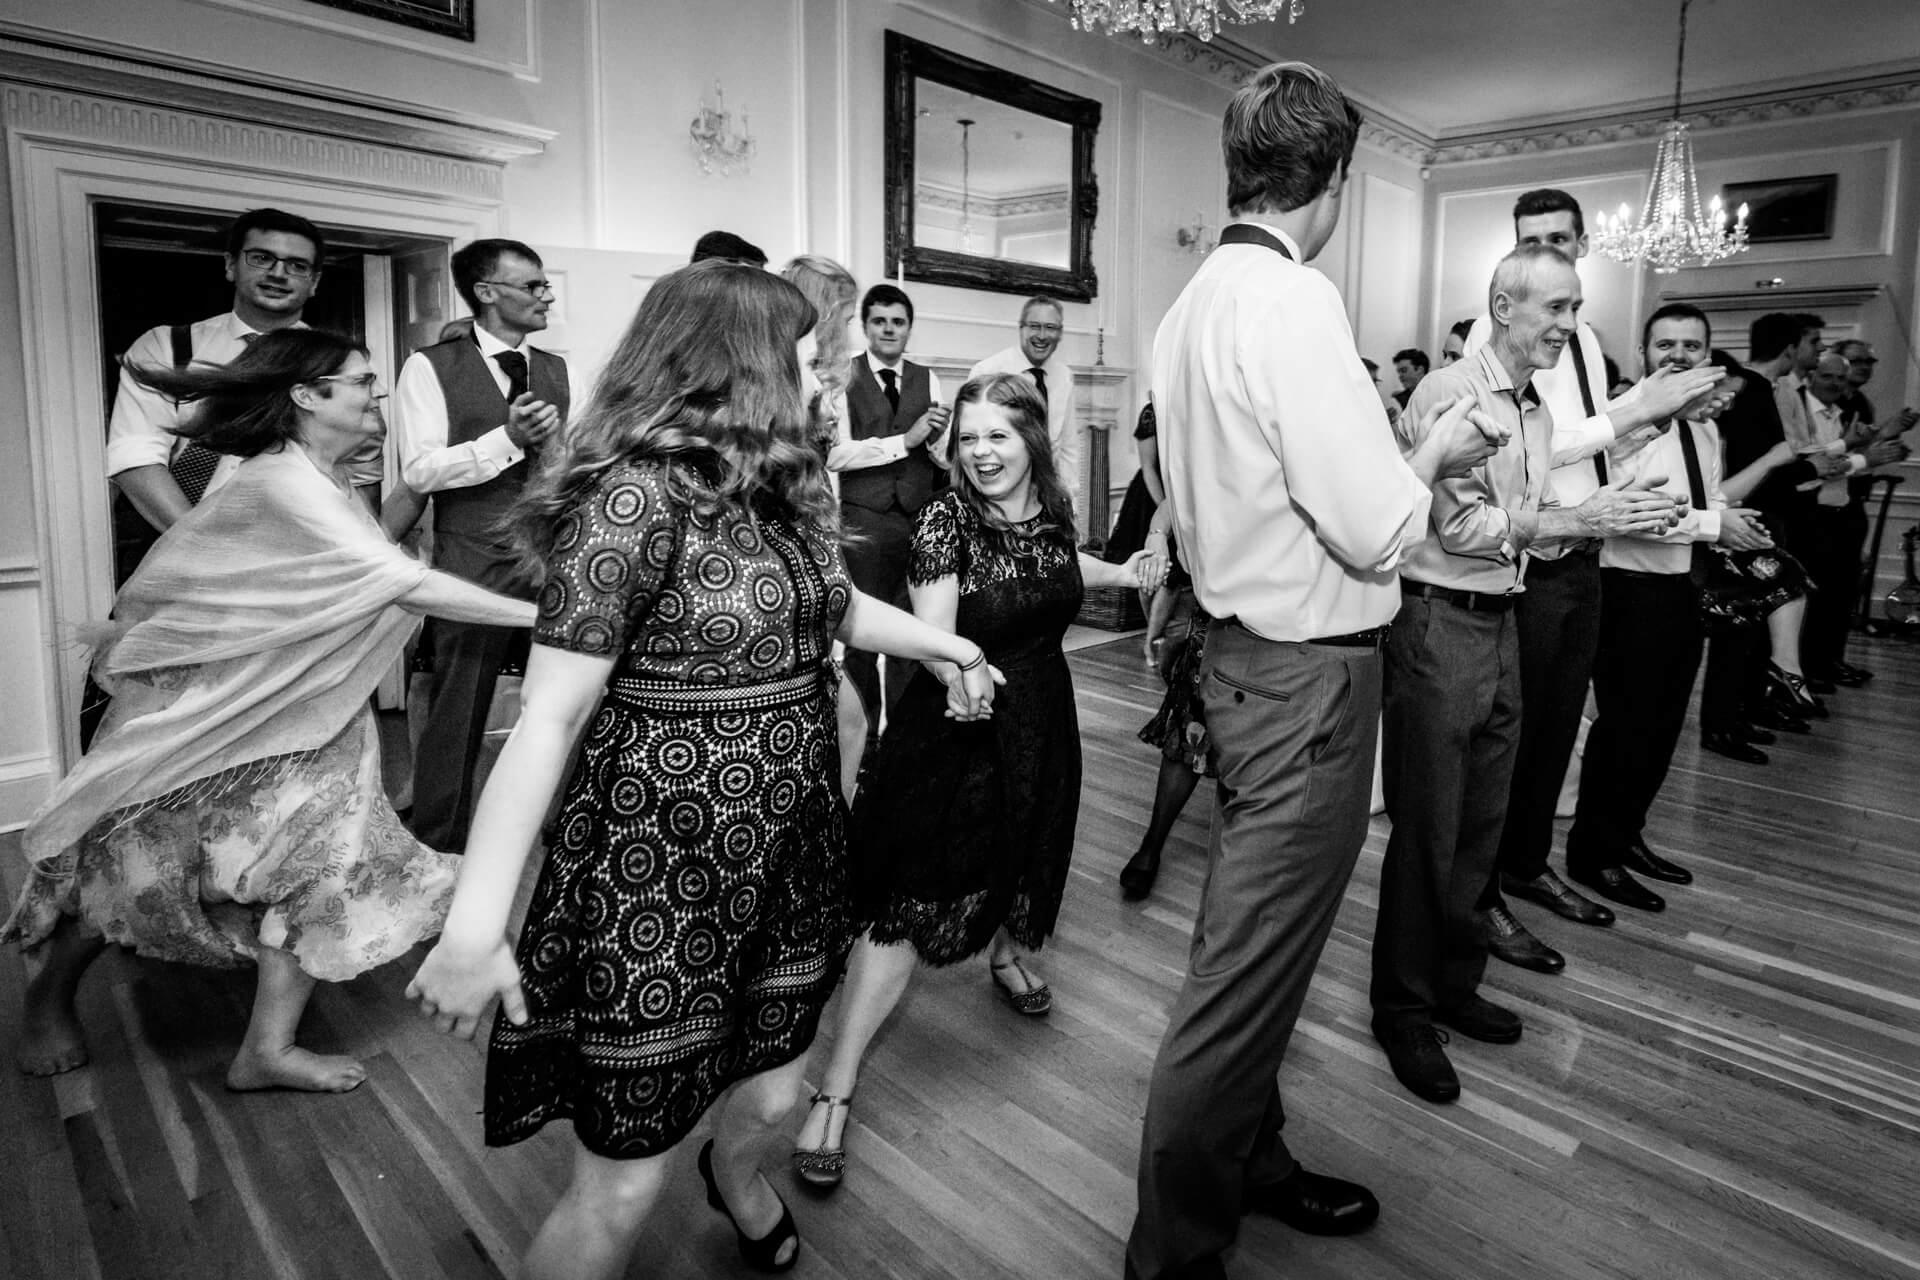 wedding guests dancing a ceilidh